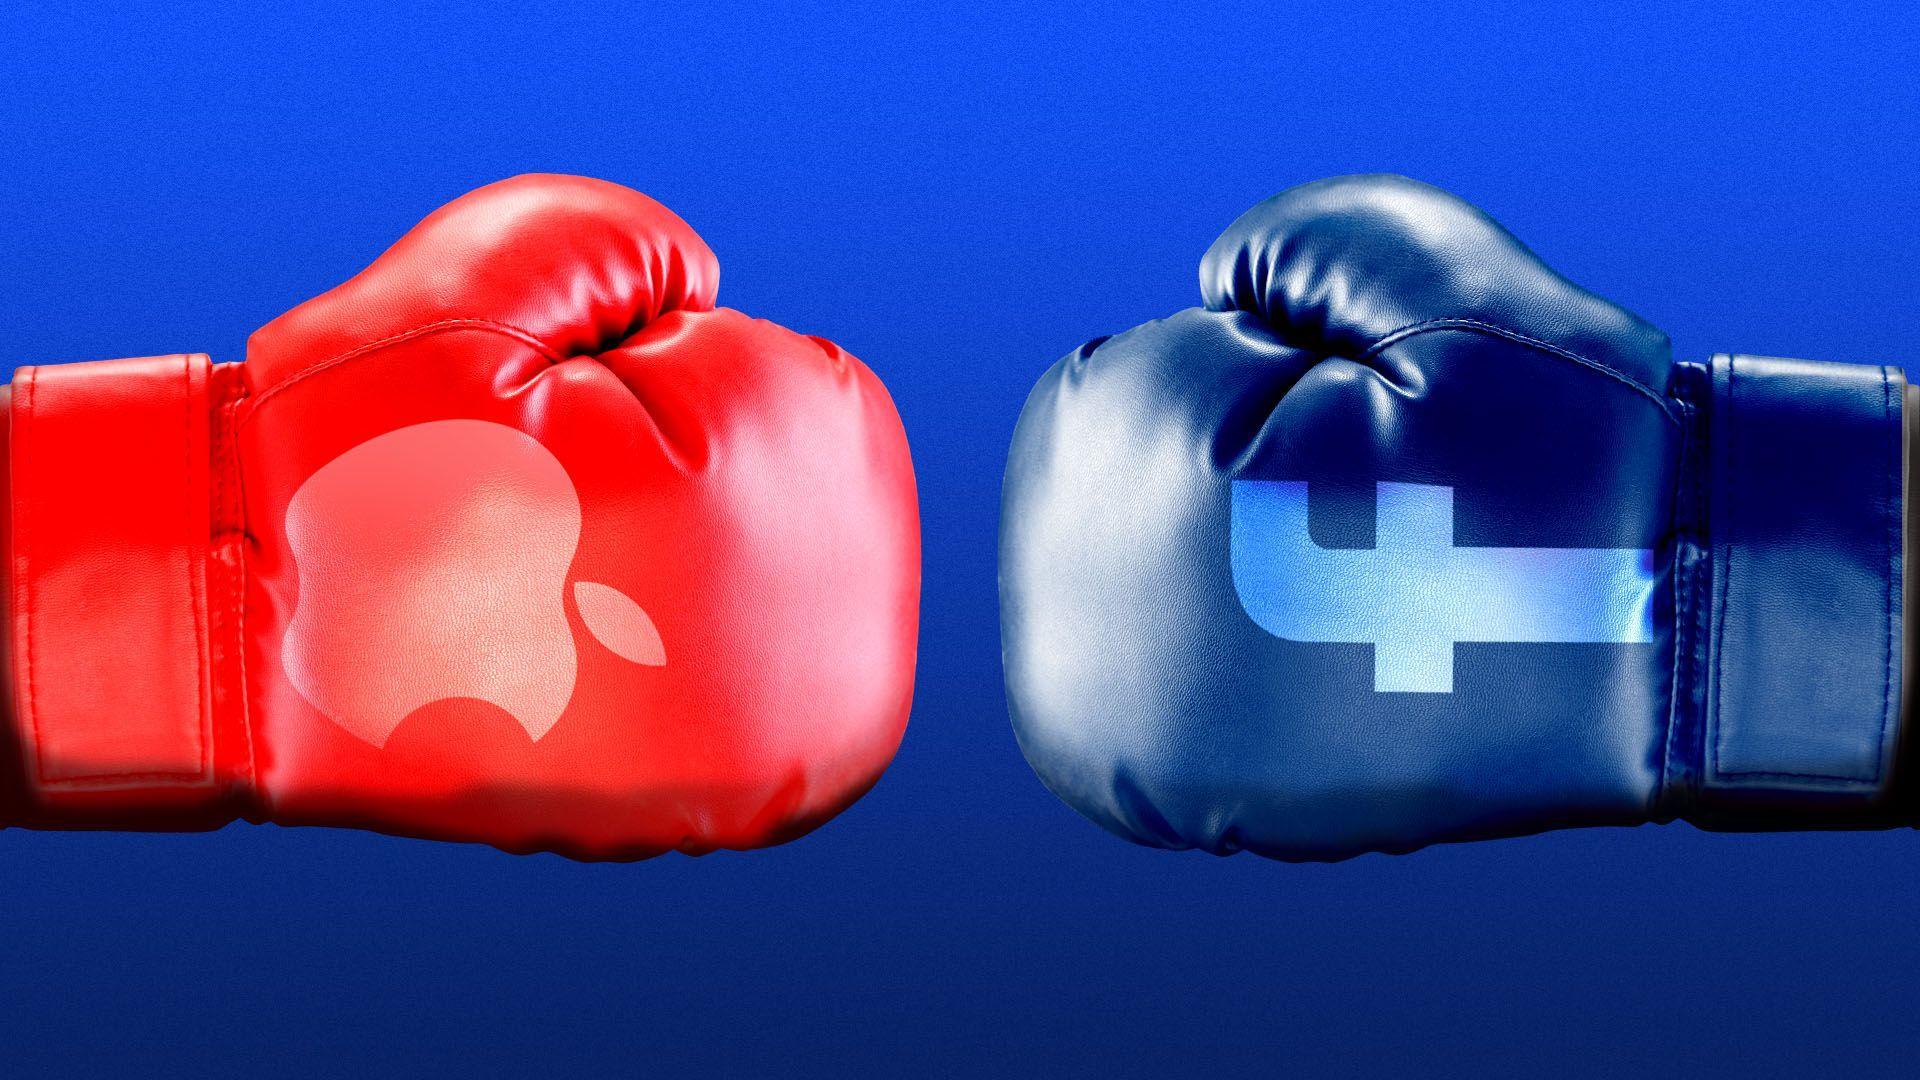 Frenemies Facebook and Apple square off